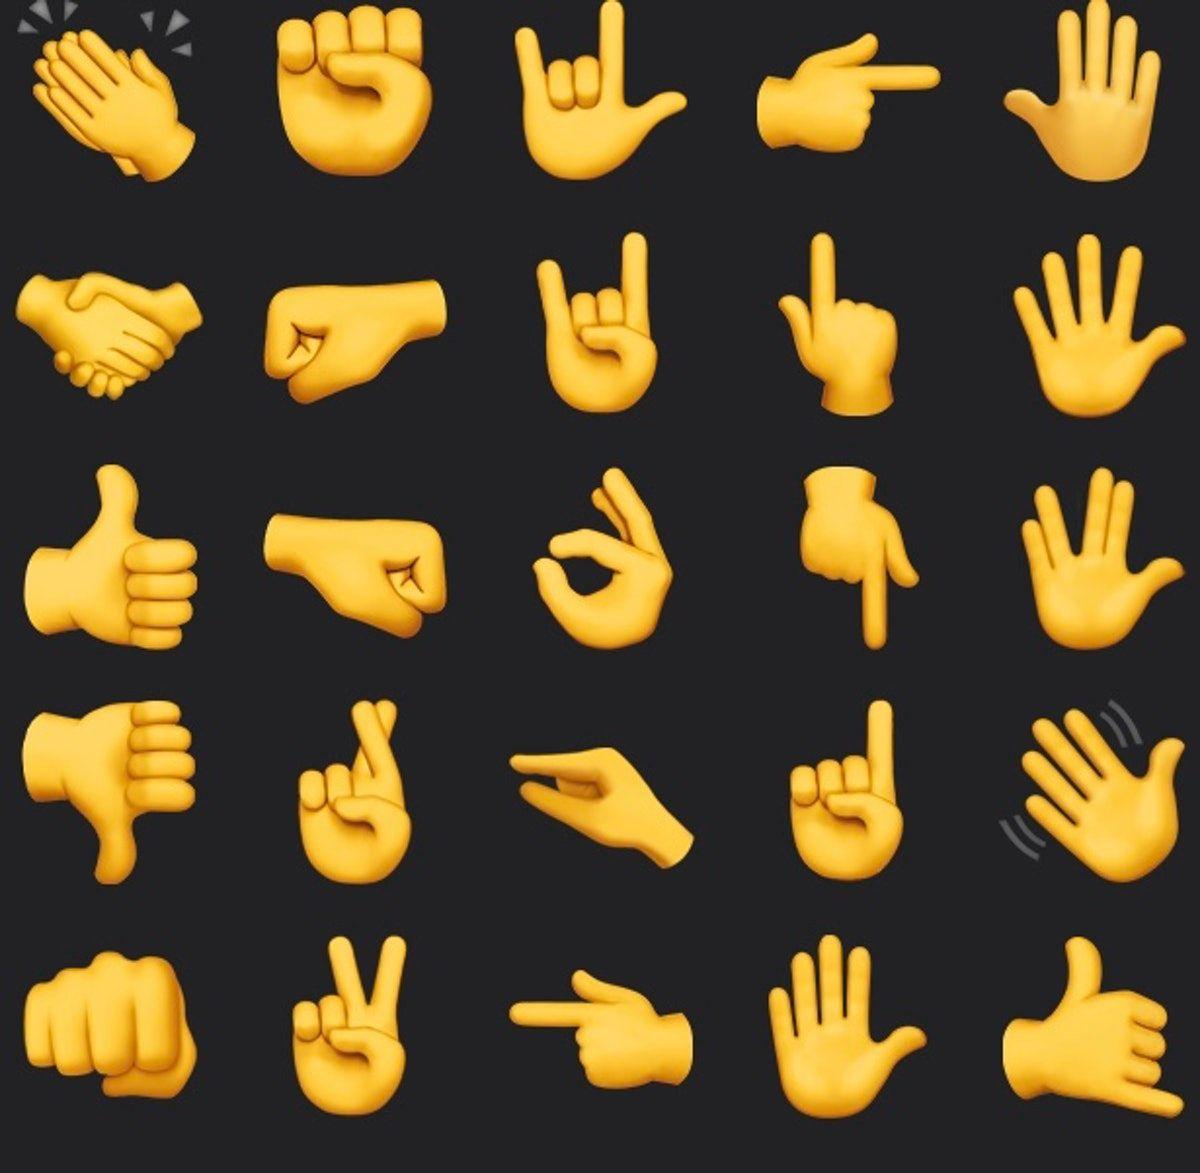 Handshake Emoji Download Iphone Emojis Hand Emoji Emoji Cool Emoji